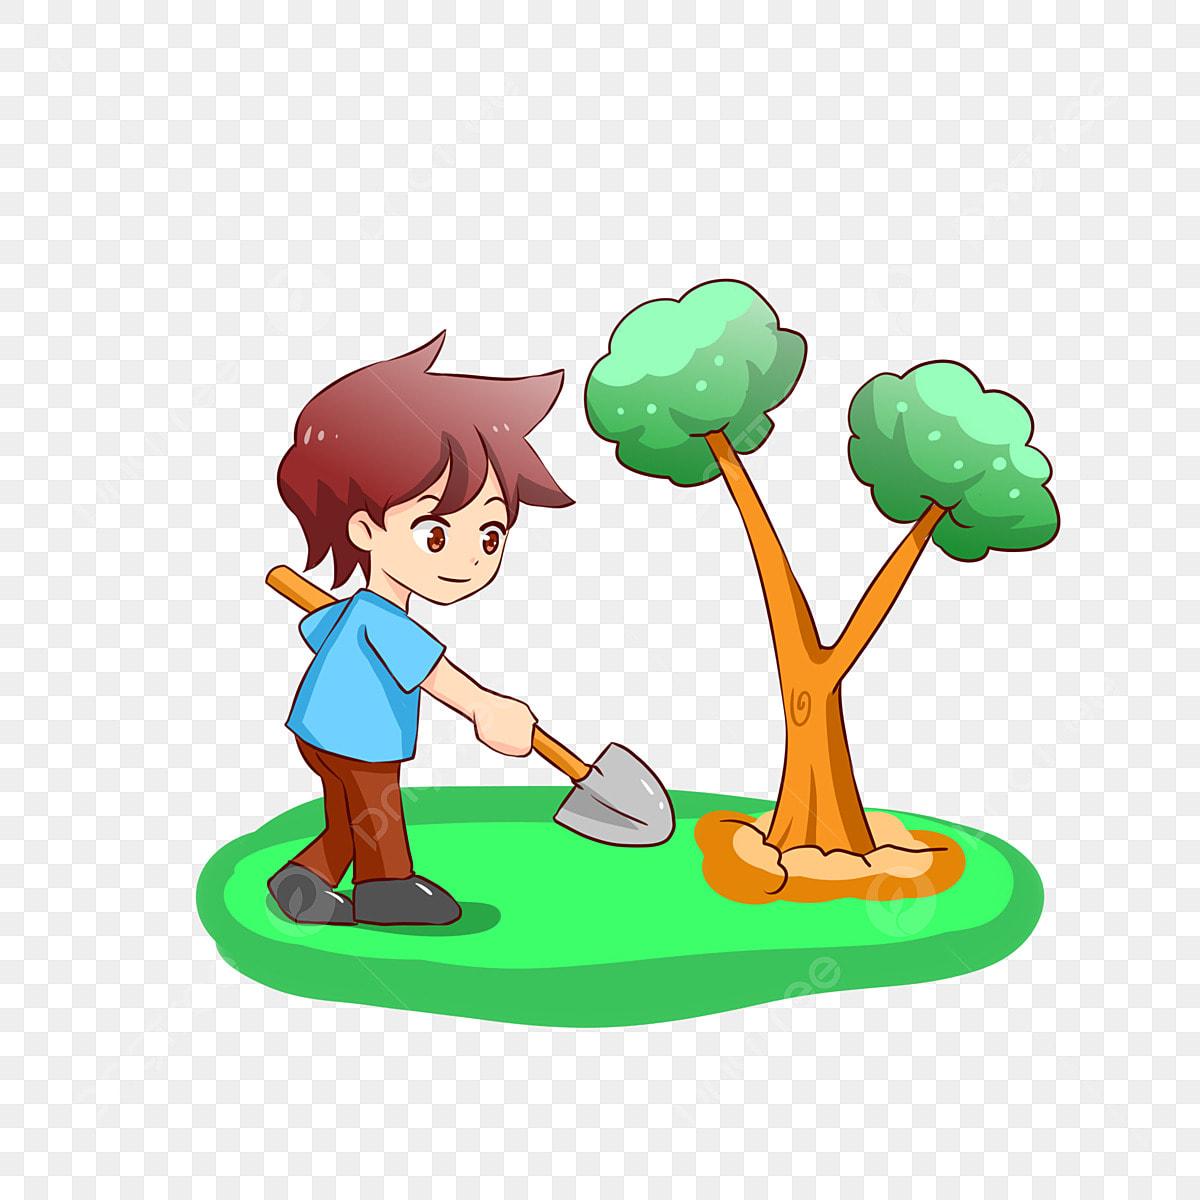 Little Boy Planting Tree Png المتجهات Psd قصاصة فنية تحميل مجاني Pngtree